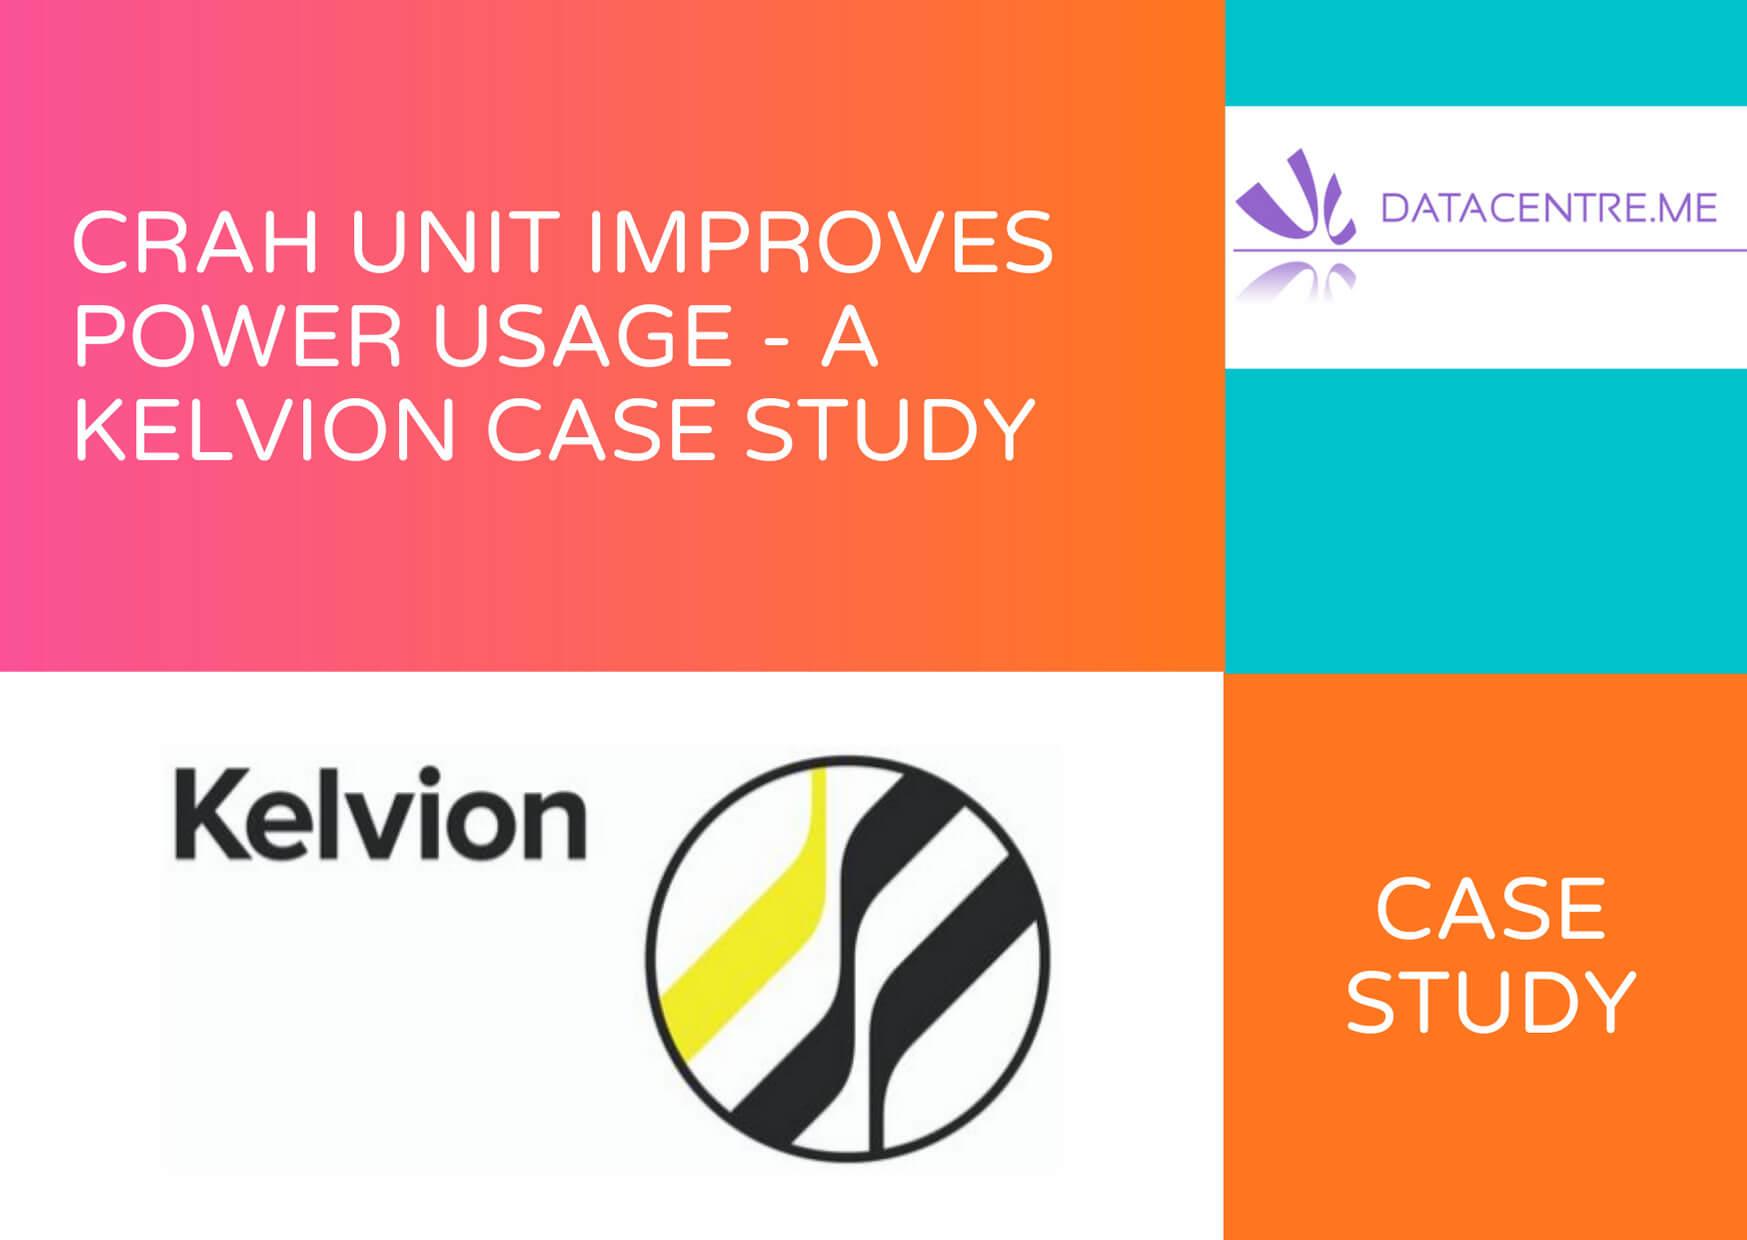 CRAH Unit Improves Power Usgae - A Kelvion Case Study